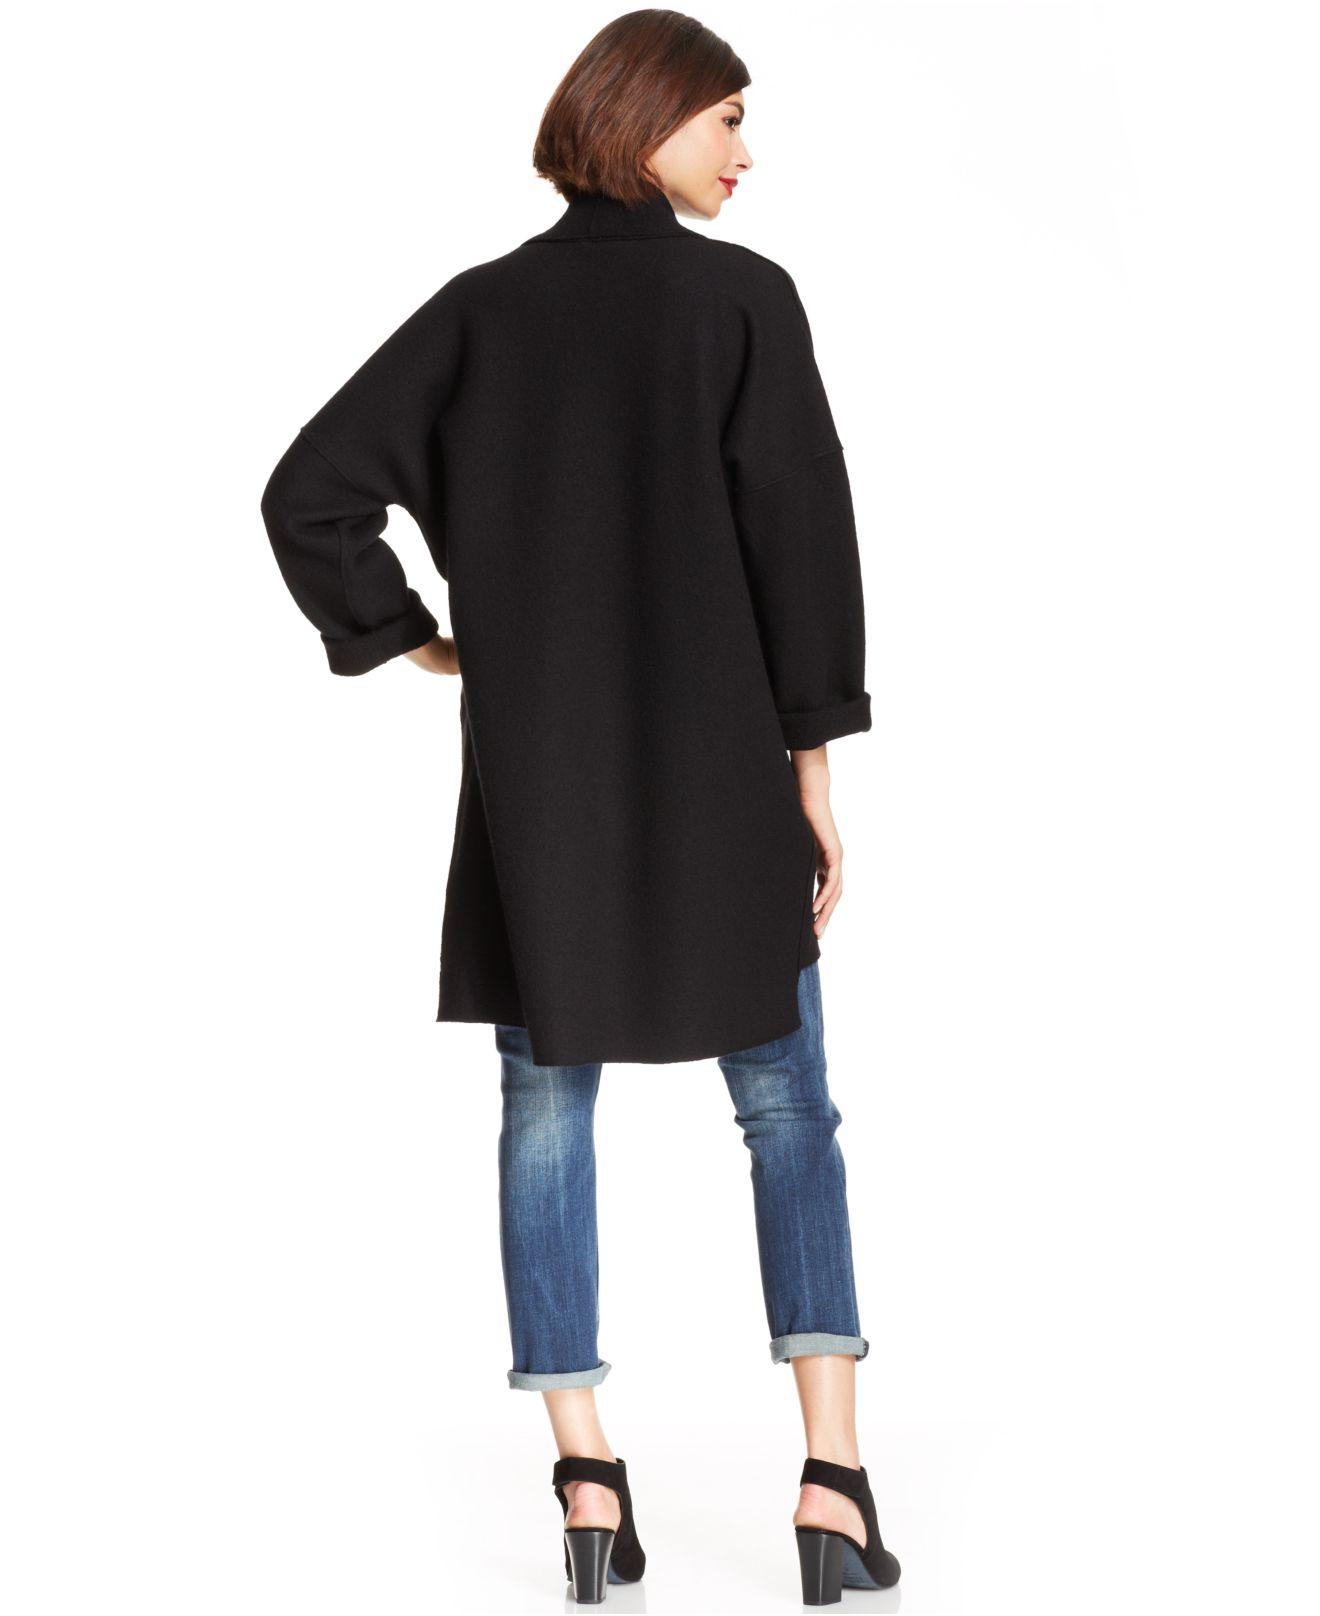 Eileen fisher Merino-Wool Kimono Cardigan in Black | Lyst